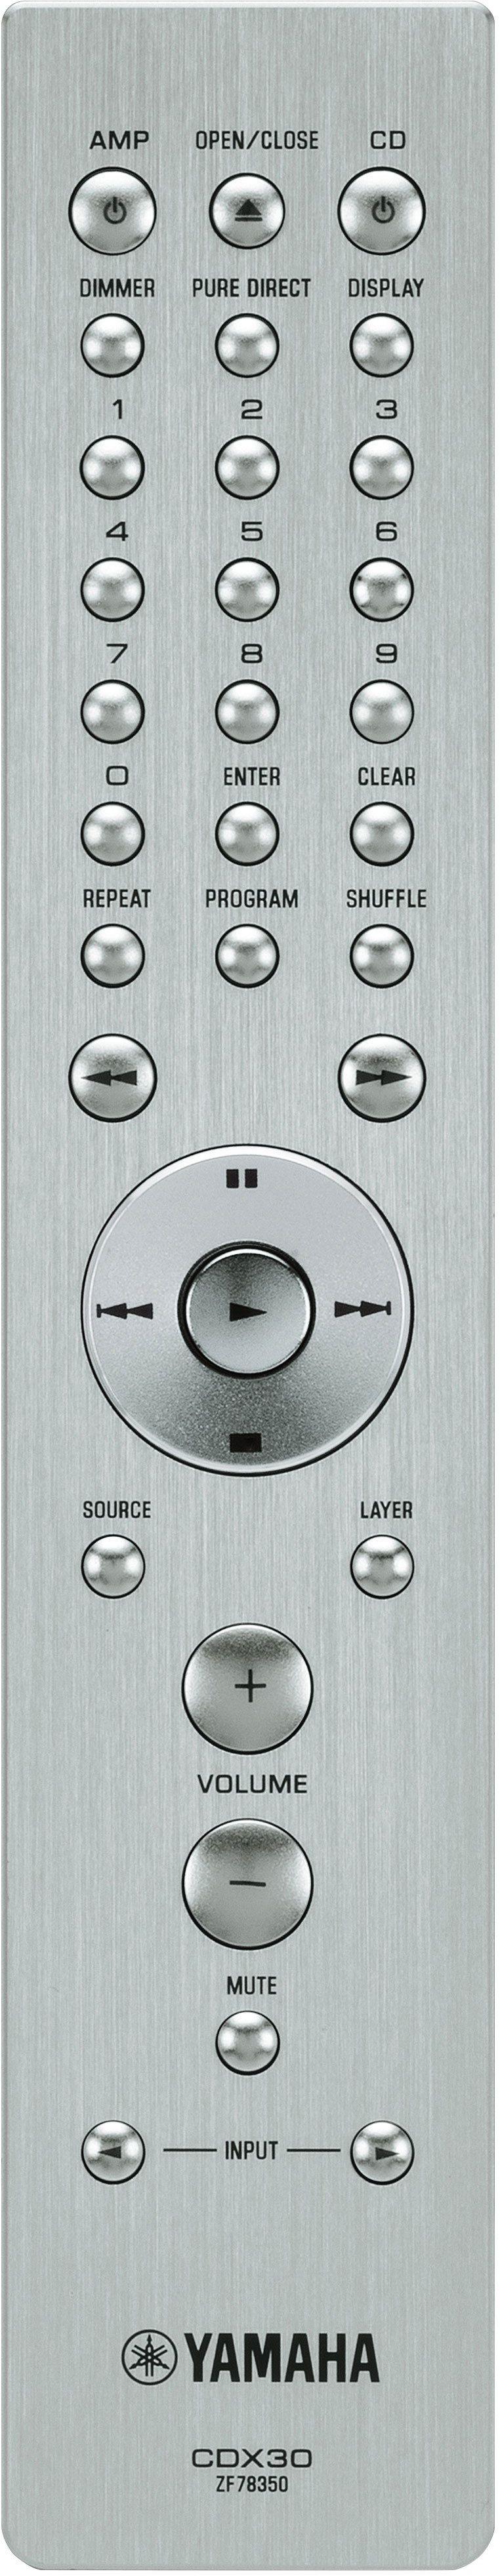 Yamaha High-Grade Cd Player-Silver-CD-S2100SL | Nawara Brothers Home